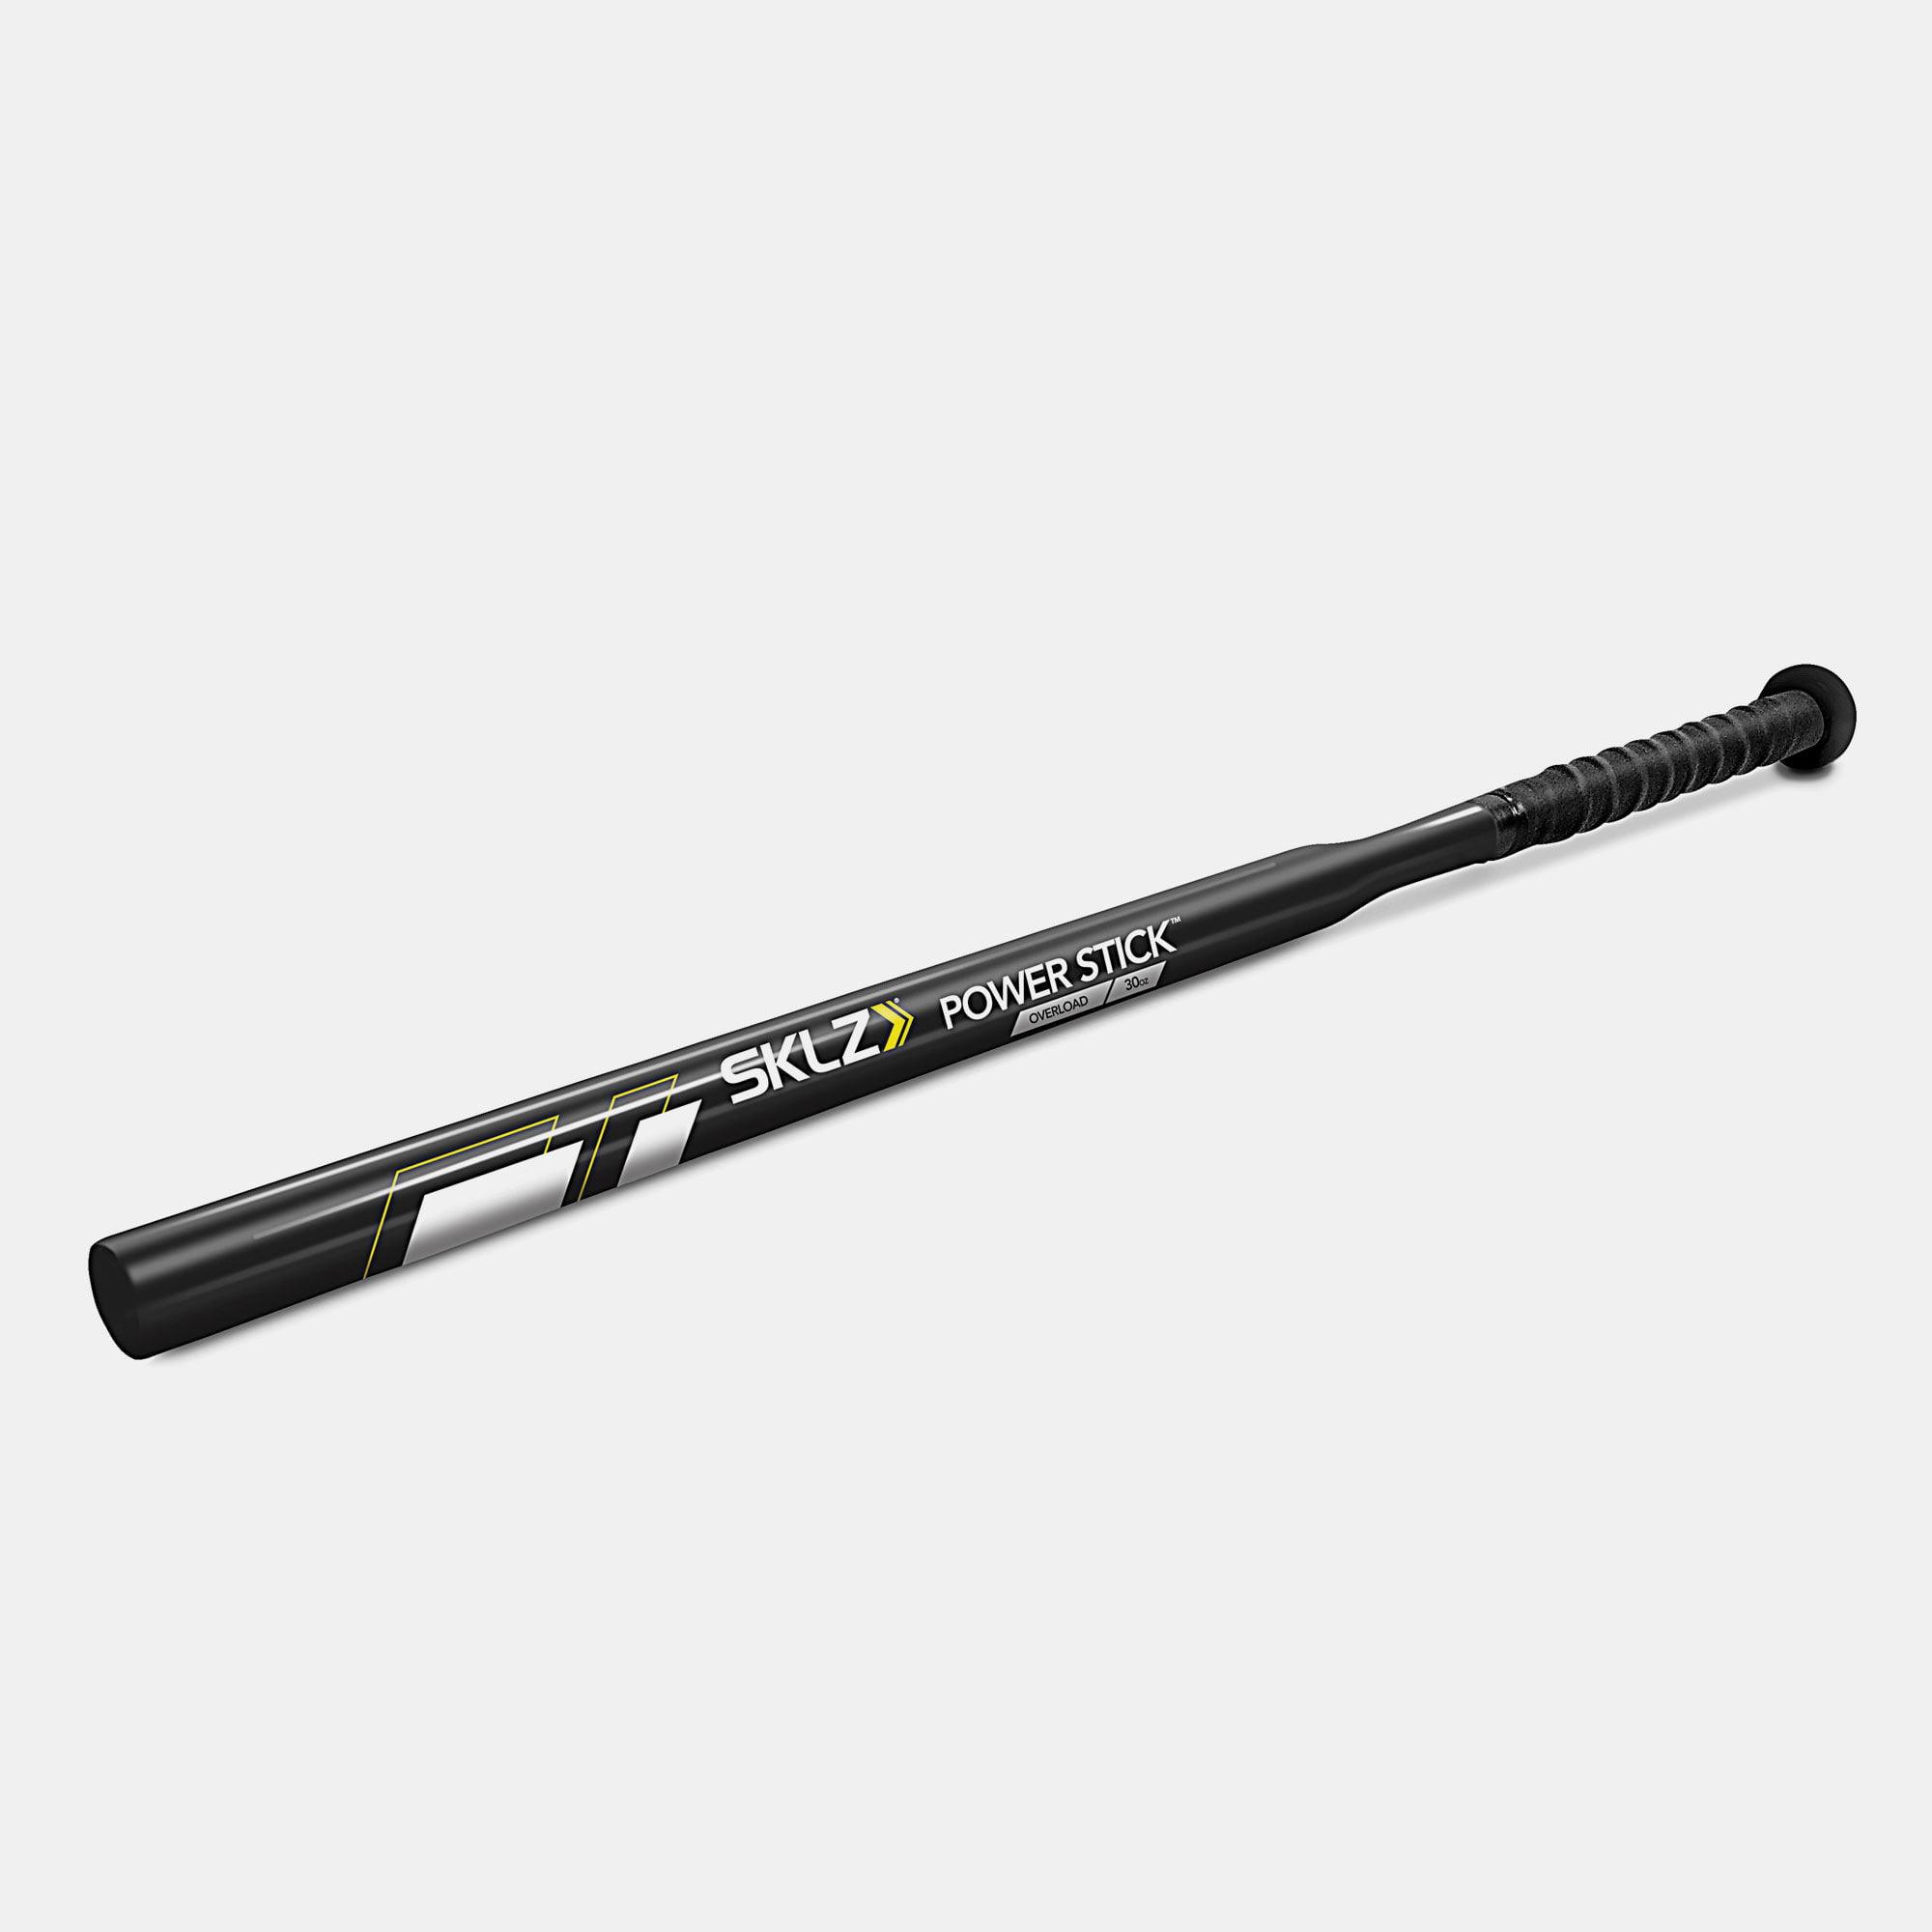 SKLZ Power Stick Baseball Bat by SKLZ